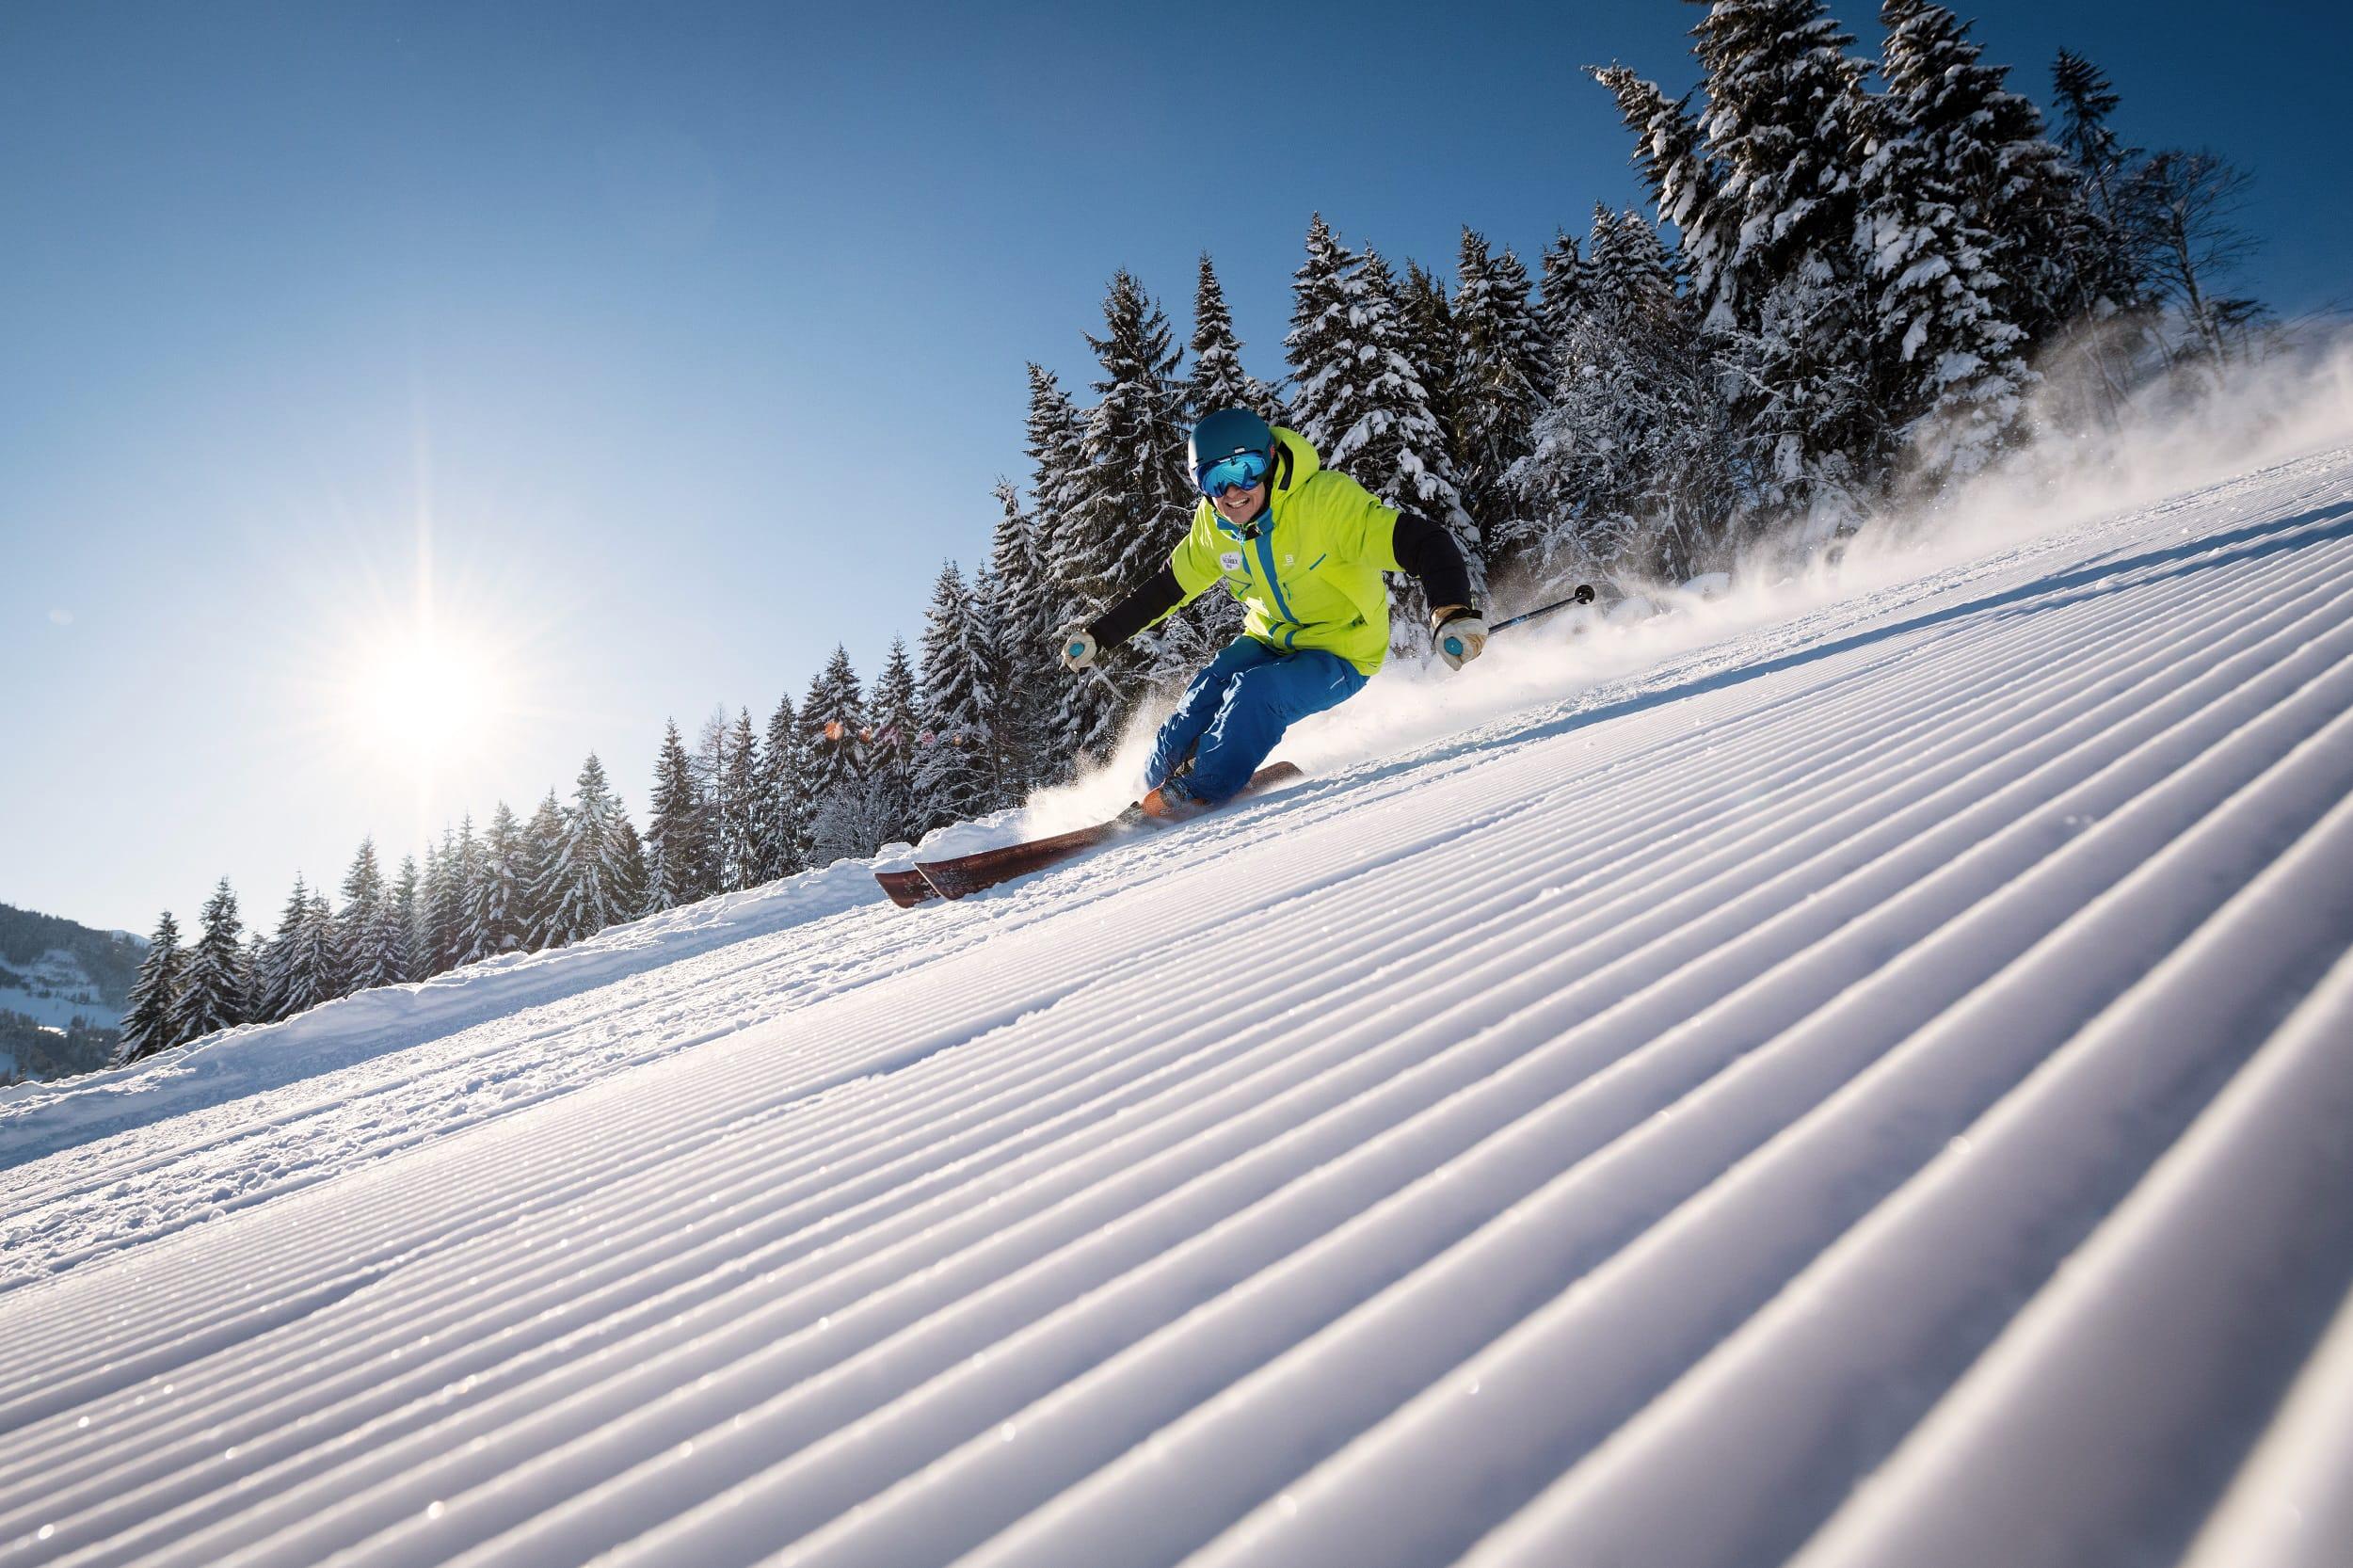 Hofgut-apartment-lifestyle-resort-Erleben-im-Hofgut-fuer-Sportler-Skifahren-Carvingschwung